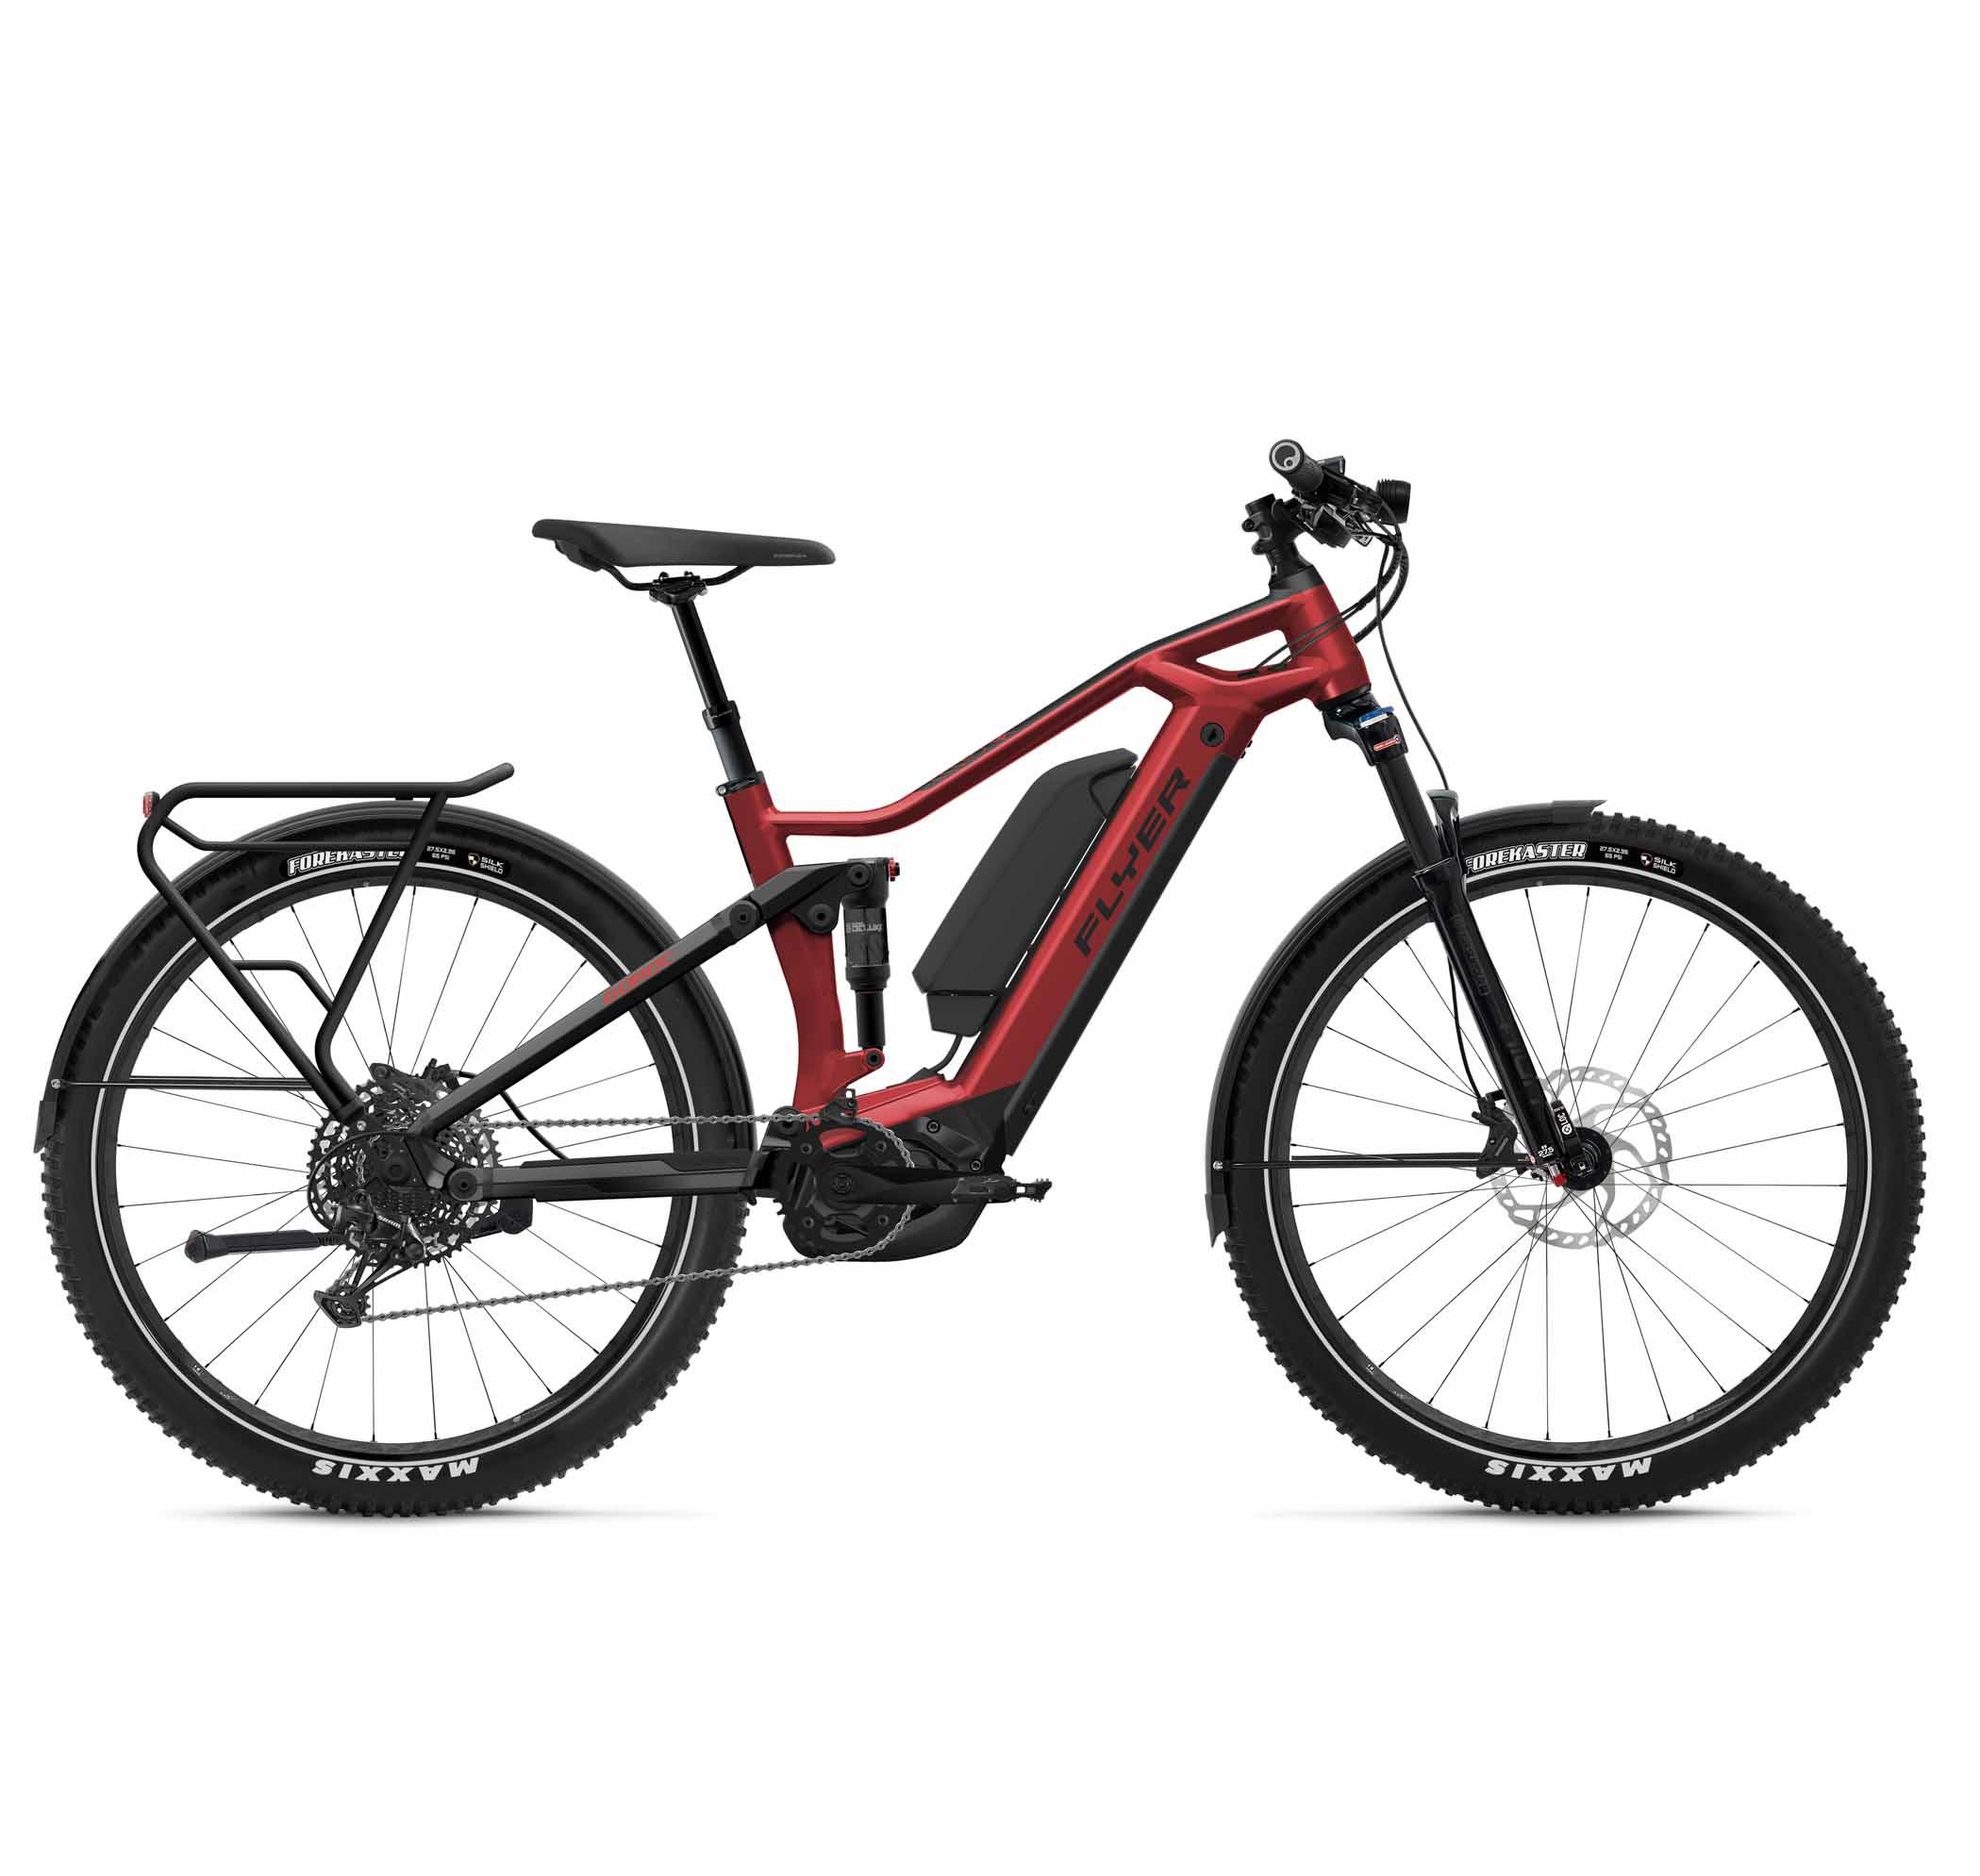 Flyer_Rodeo_Bike_eBike_Goroc_3_650_fullsuspension_DB_MercuryRedBlackGloss